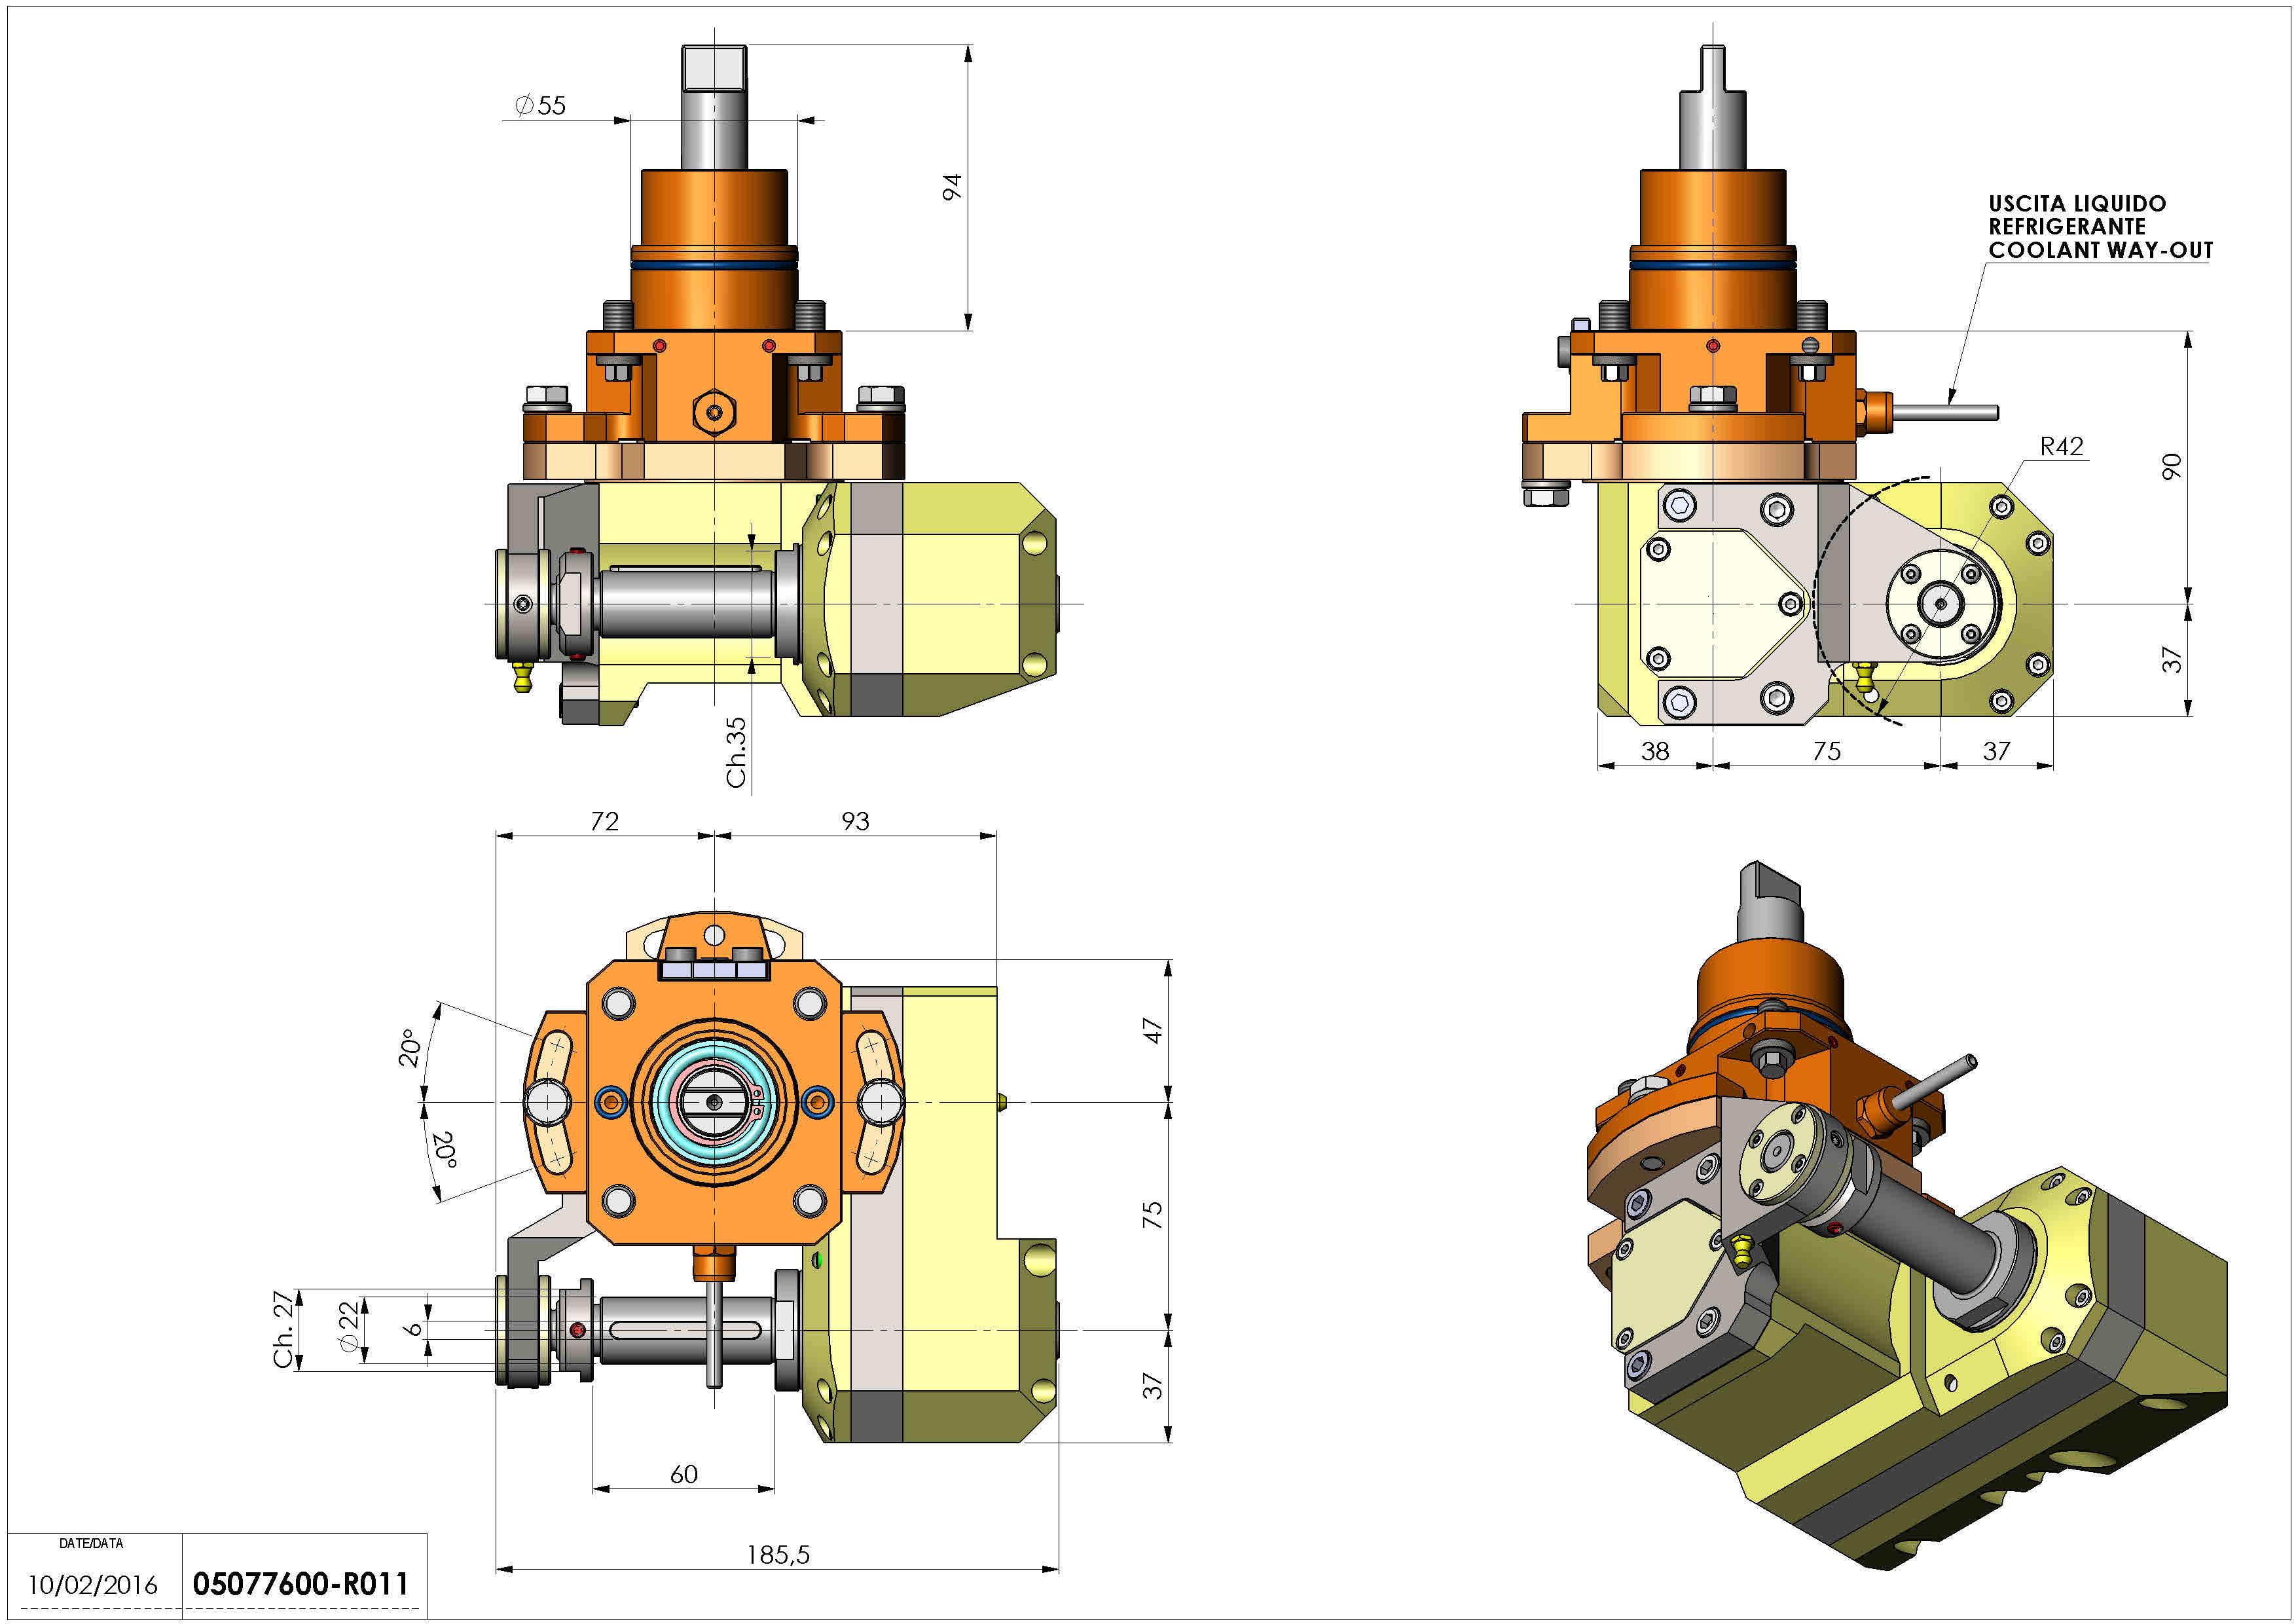 Technical image - LT-HOB-SAW D55 2.5:1 H90.